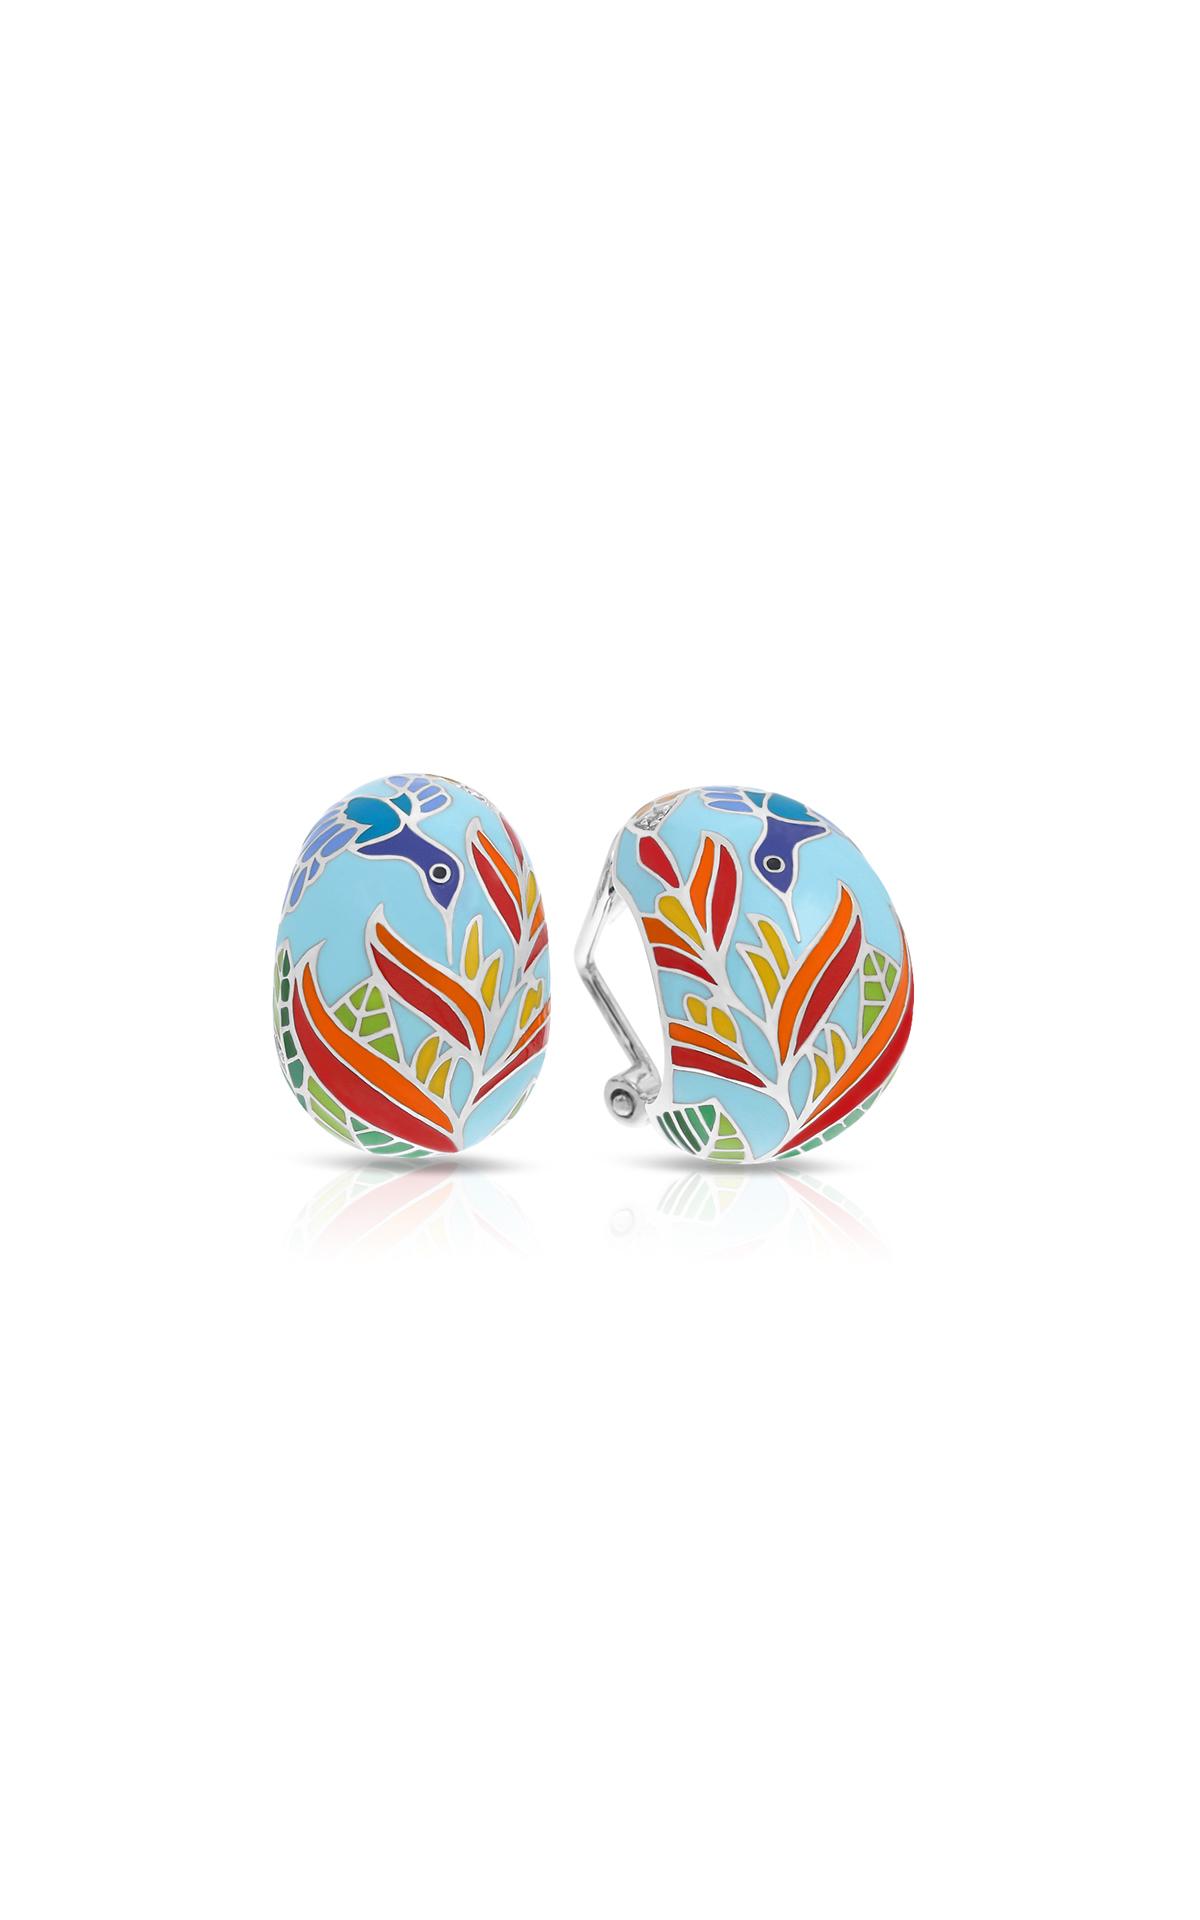 Belle Etoile Hummingbird Sky Blue Earrings 3021710401 product image